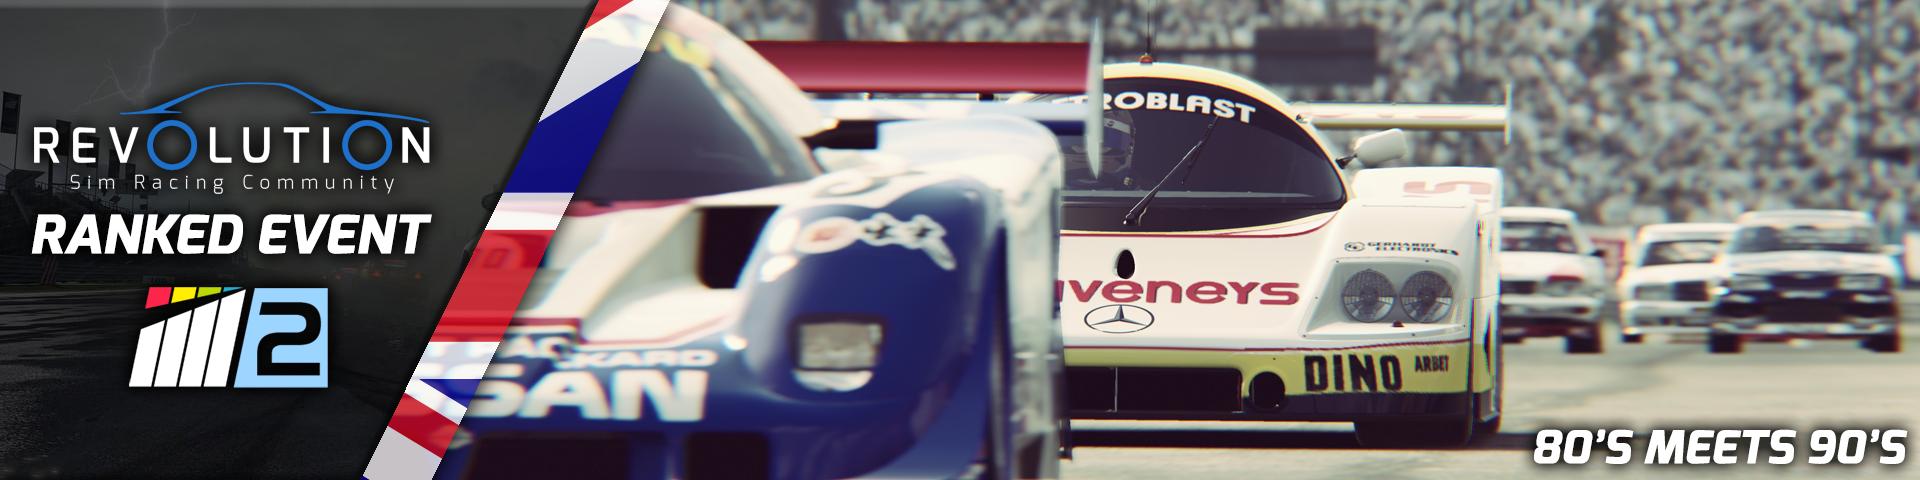 Generic Race Banner - 80's meets 90's.png